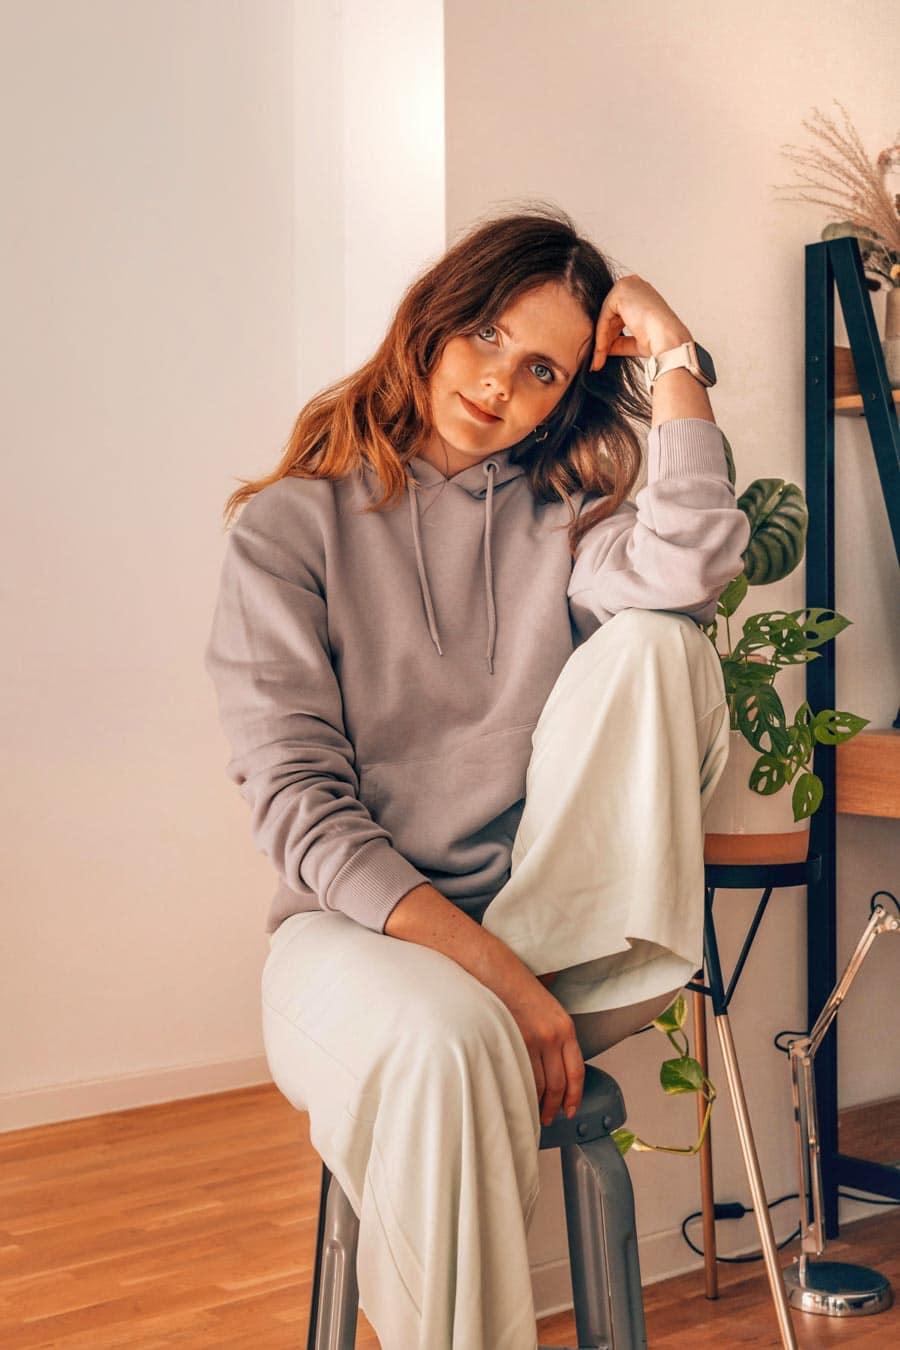 Stylische Home Office Outfit Ideen für den Frühling 2021